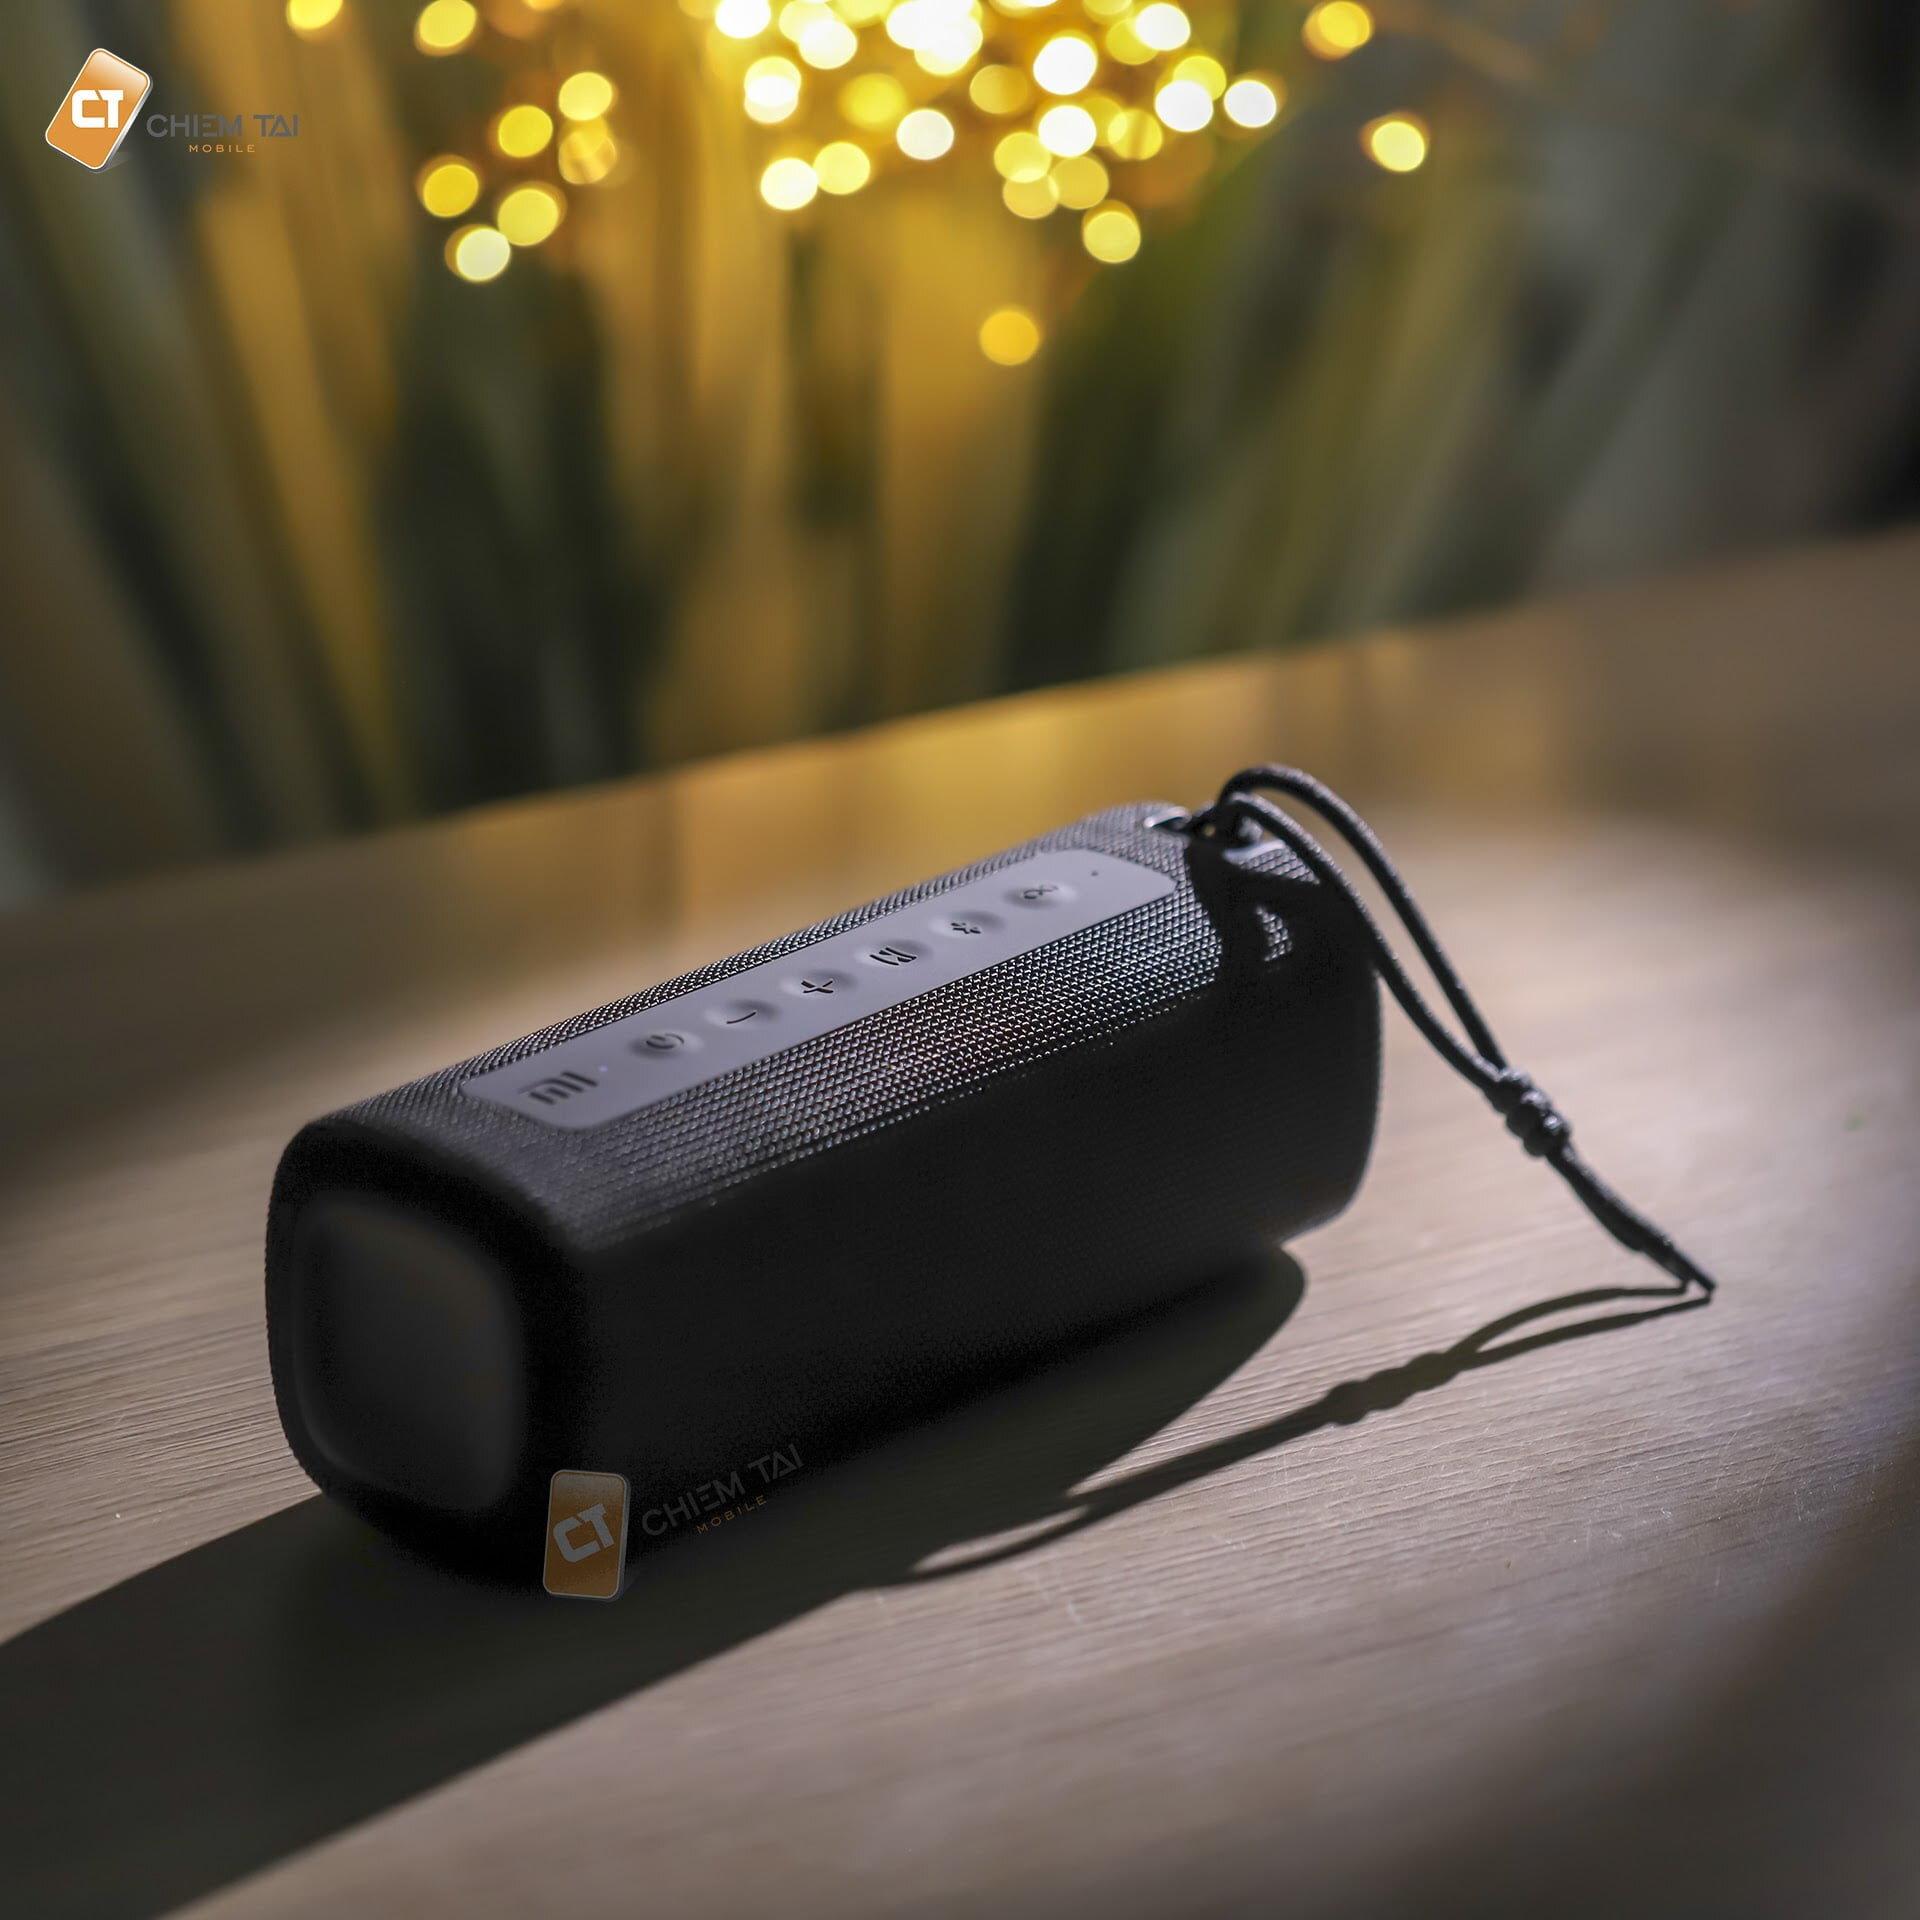 Loa Bluetooth Outdoor Xiaomi Portable Speaker 16W